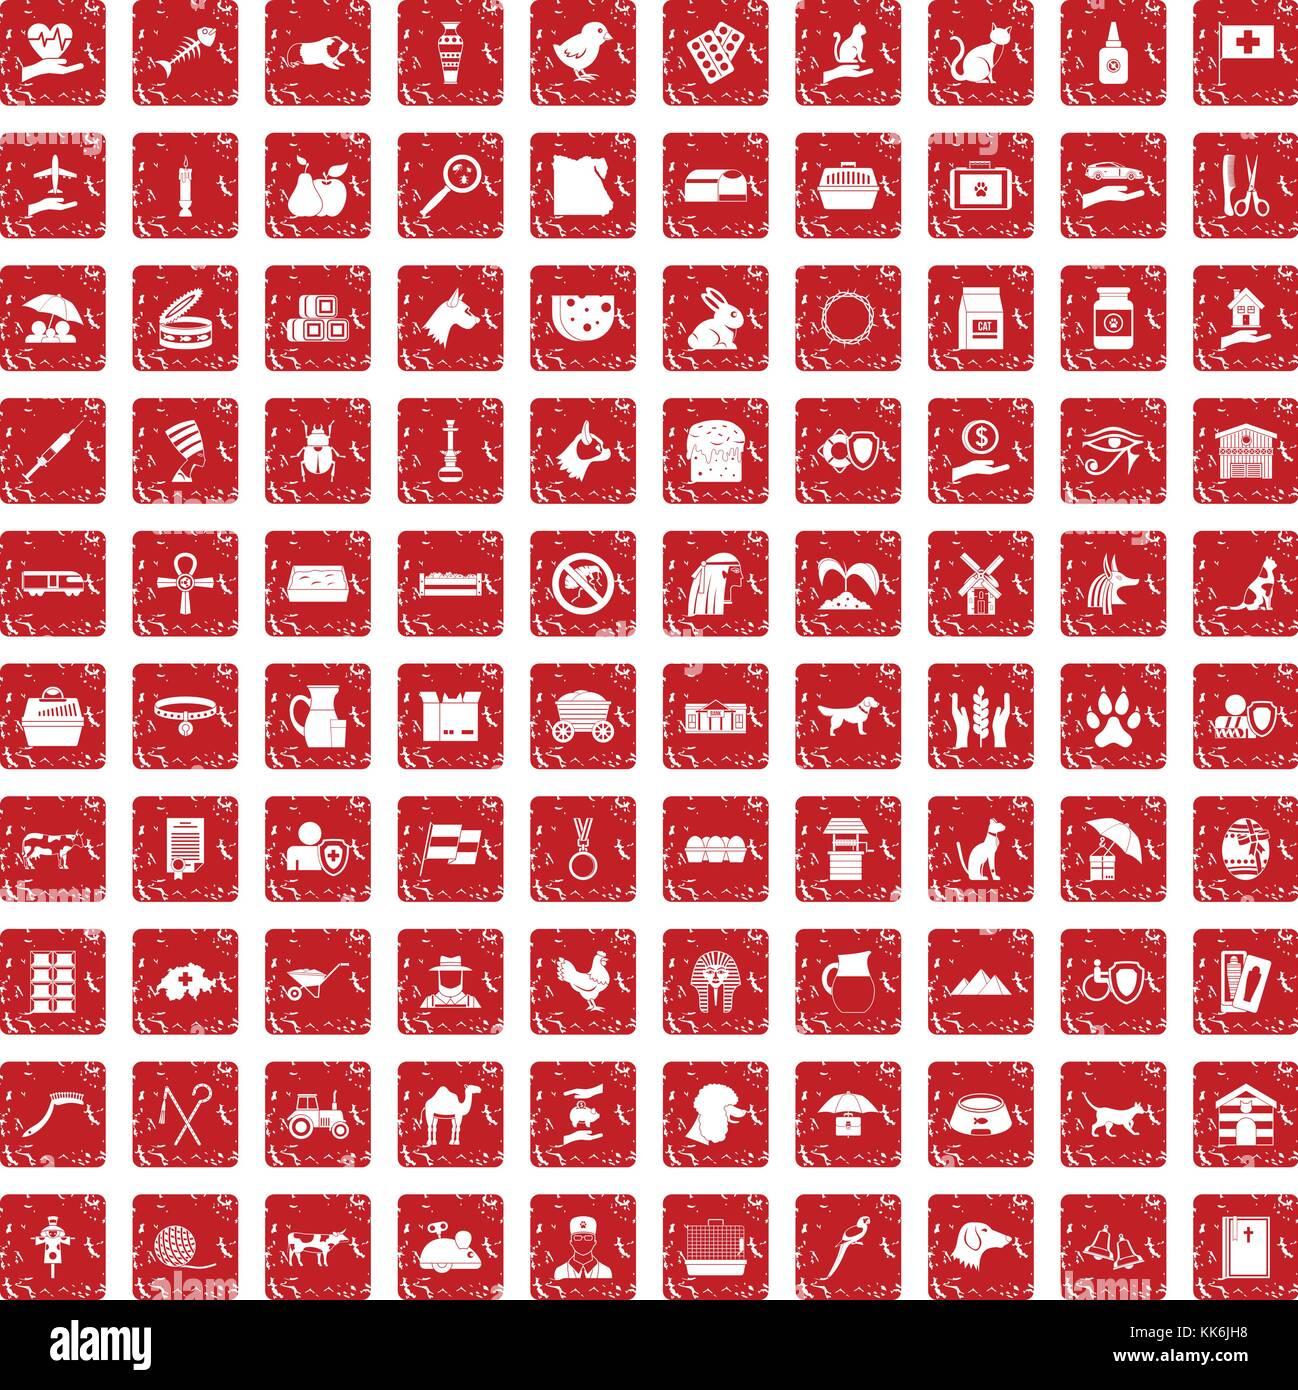 100 pets icons set grunge red - Stock Image